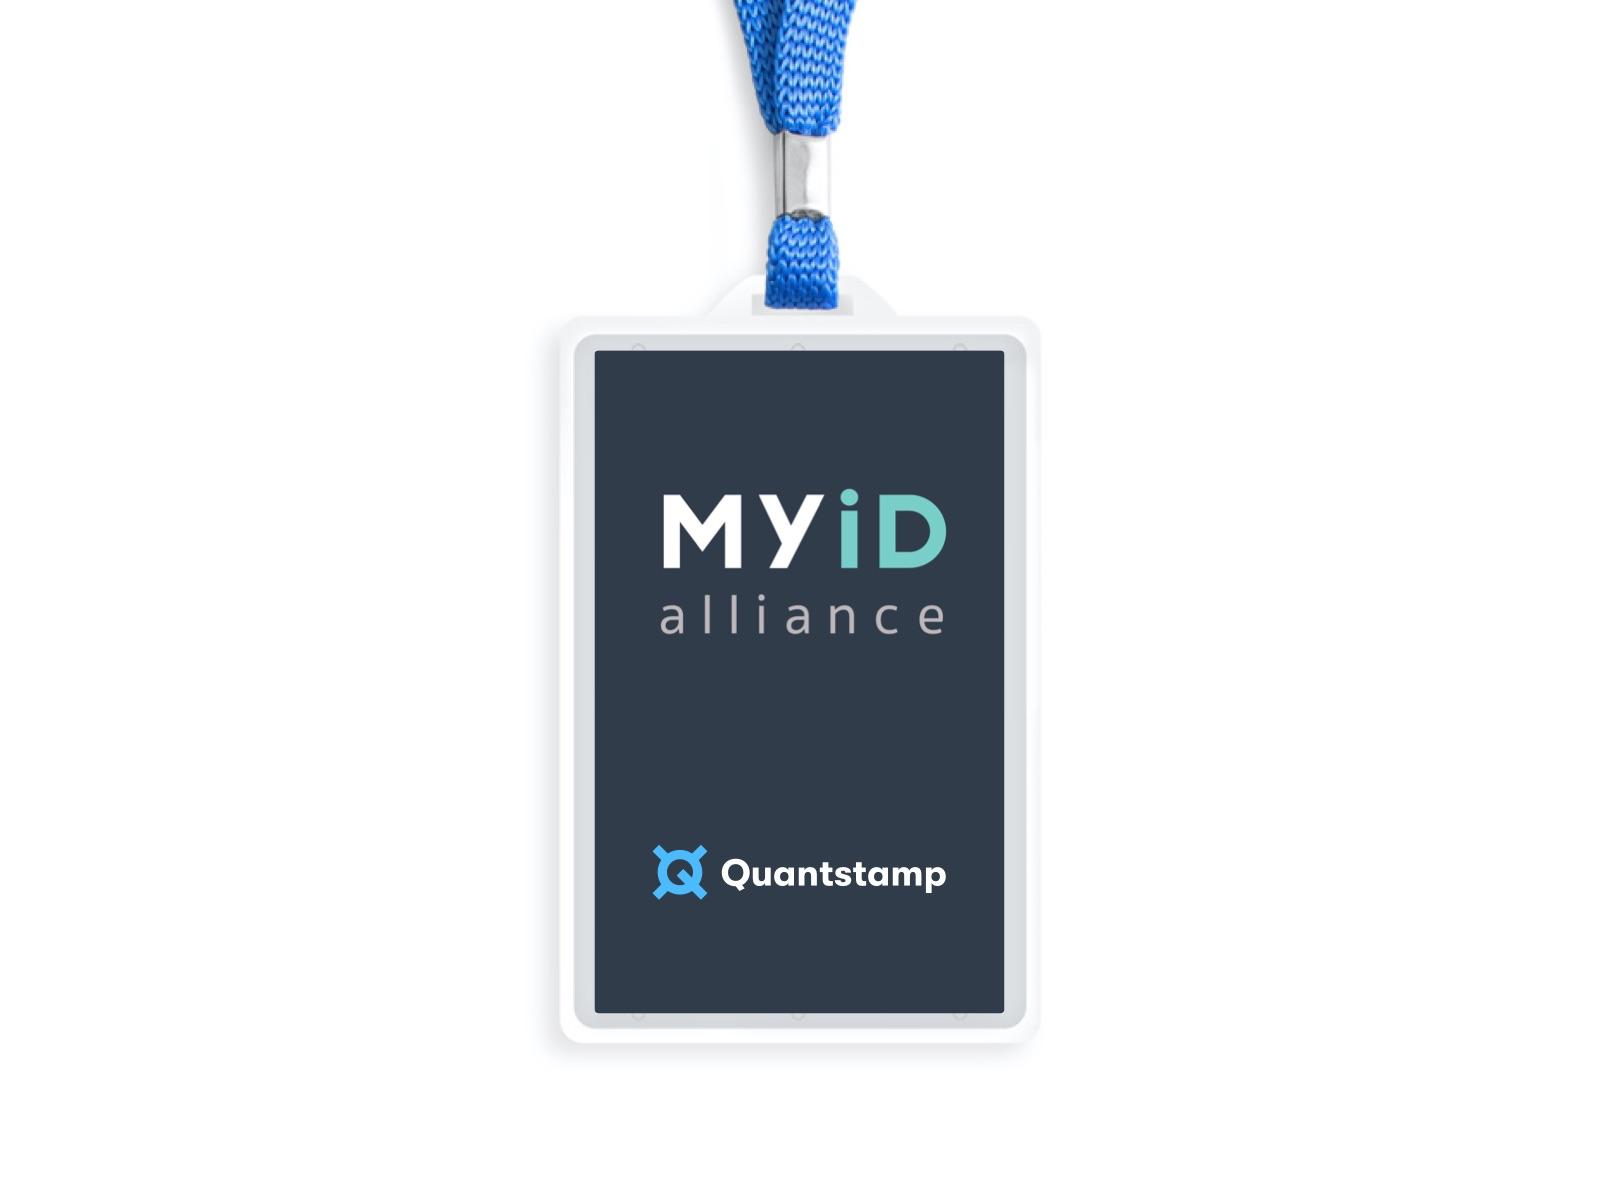 Quantstamp Joins MyID Alliance